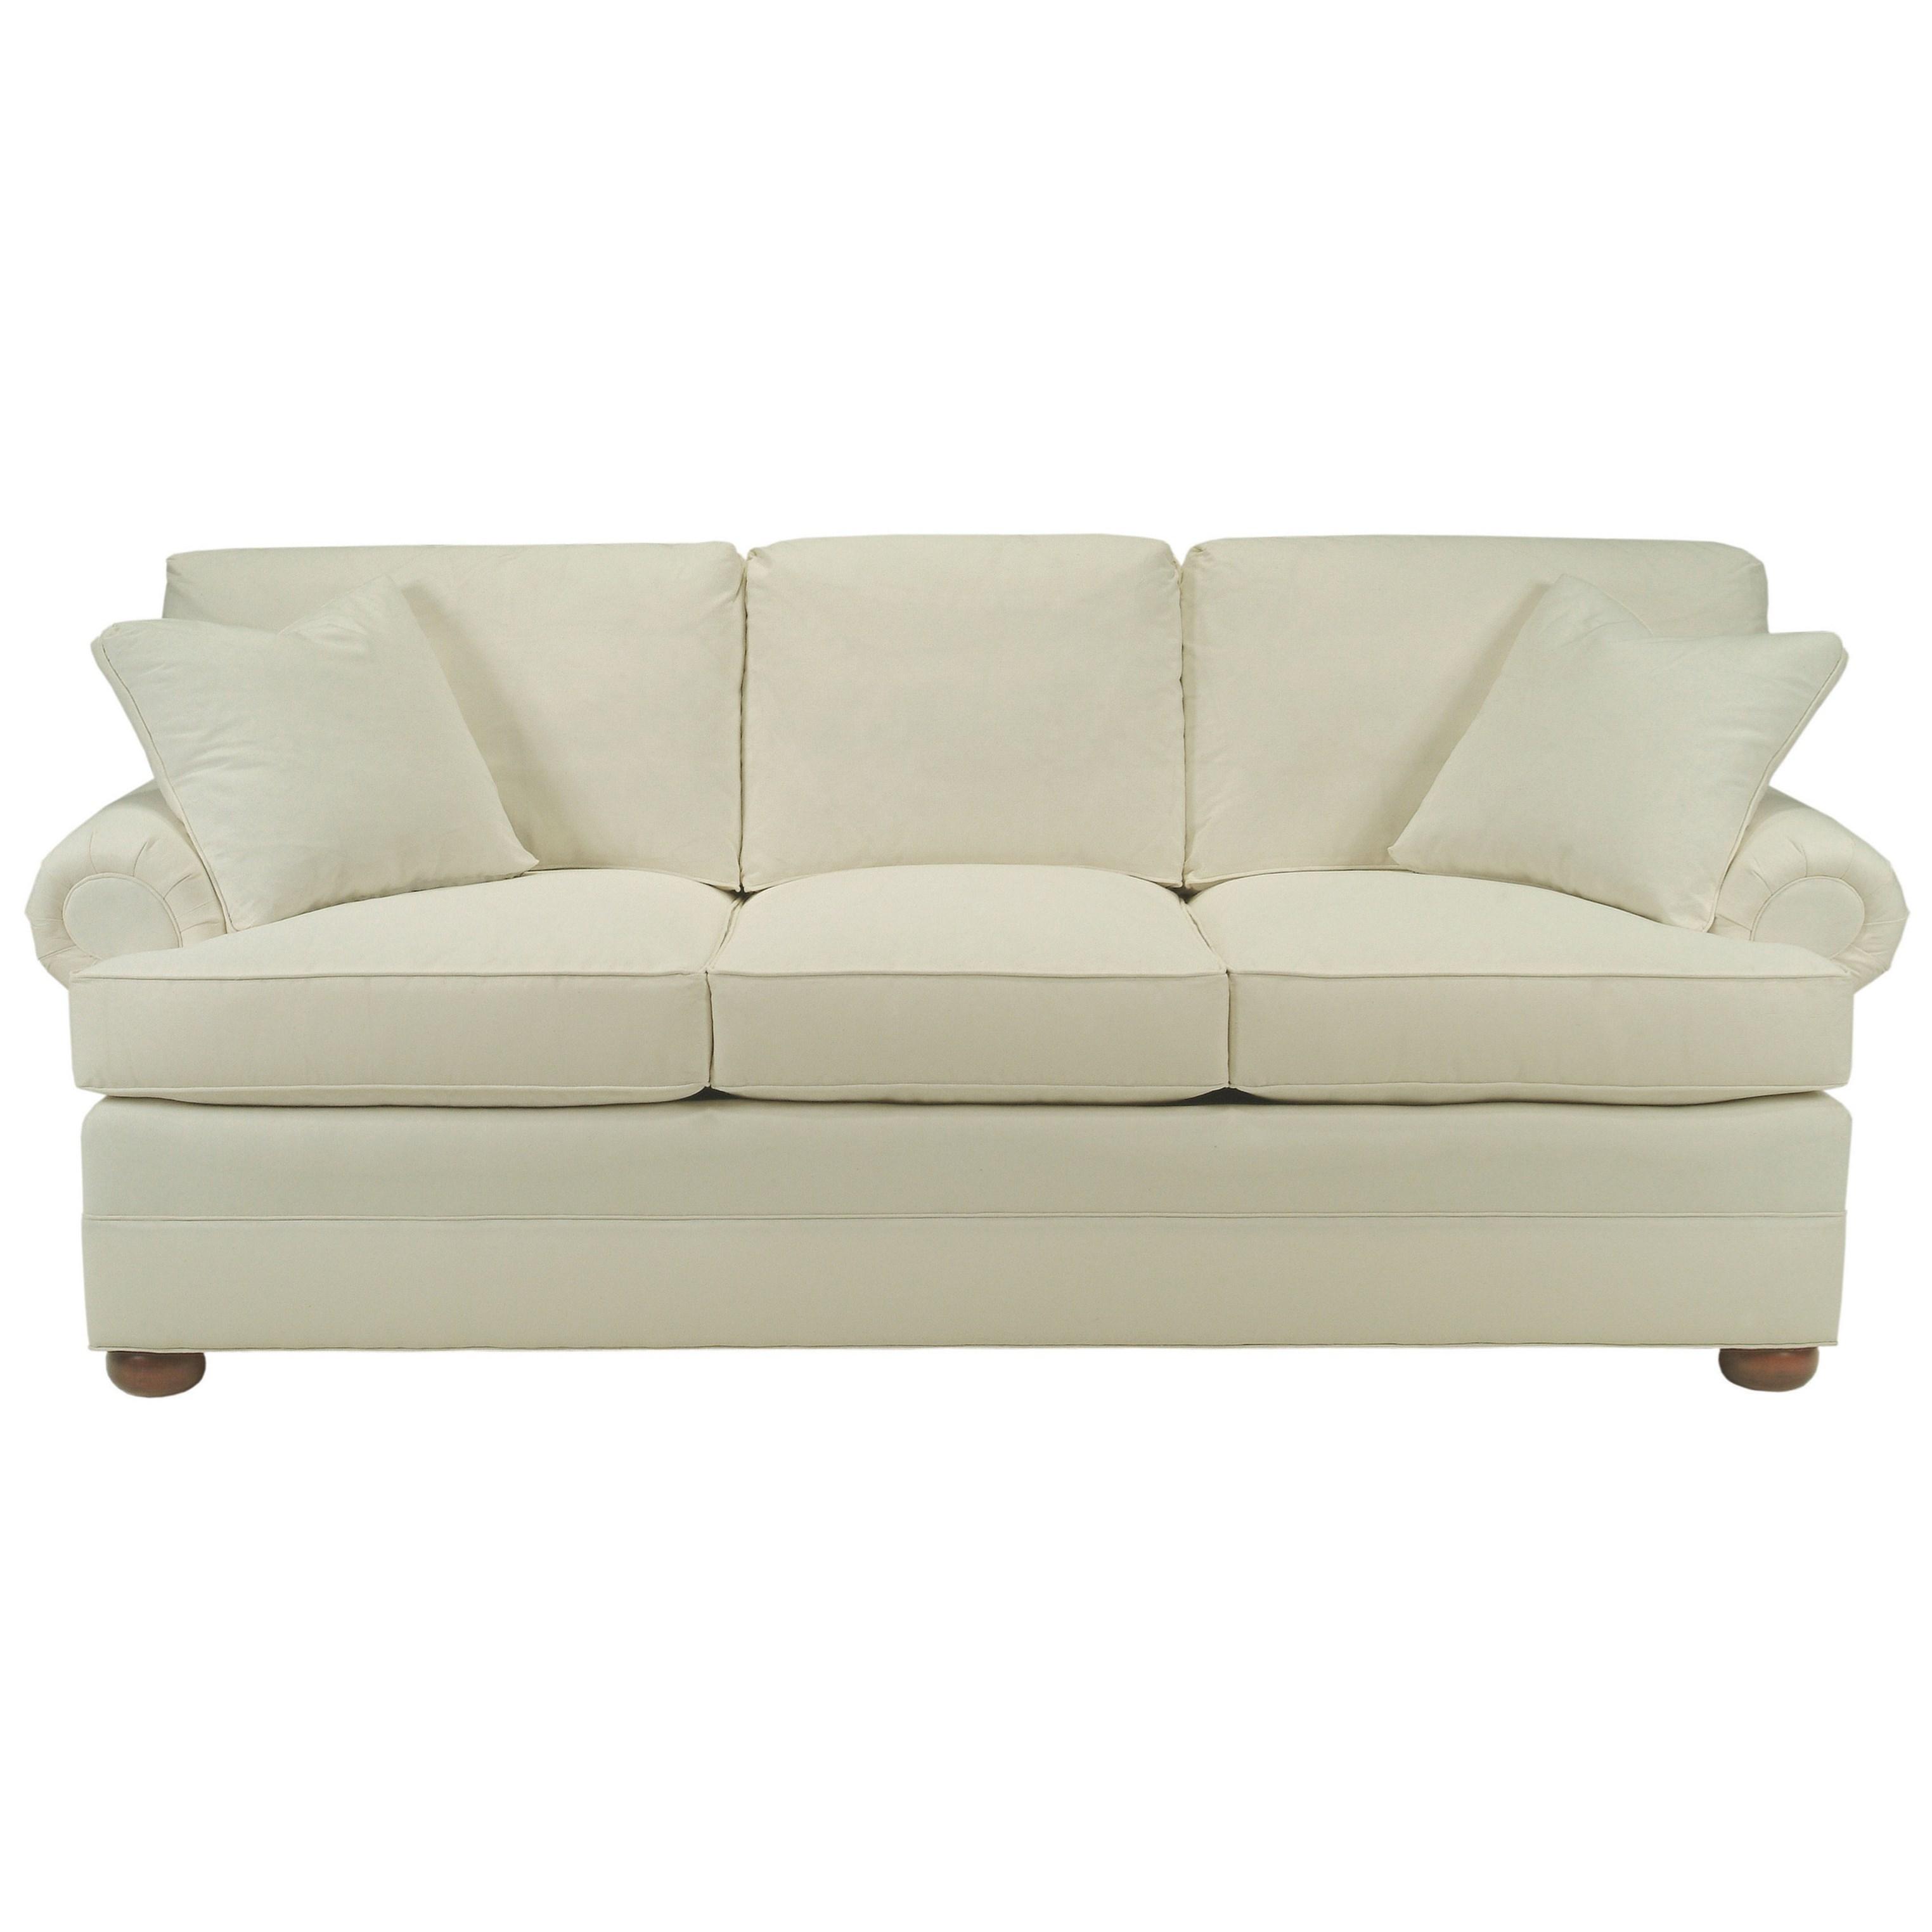 The Pines Sofa